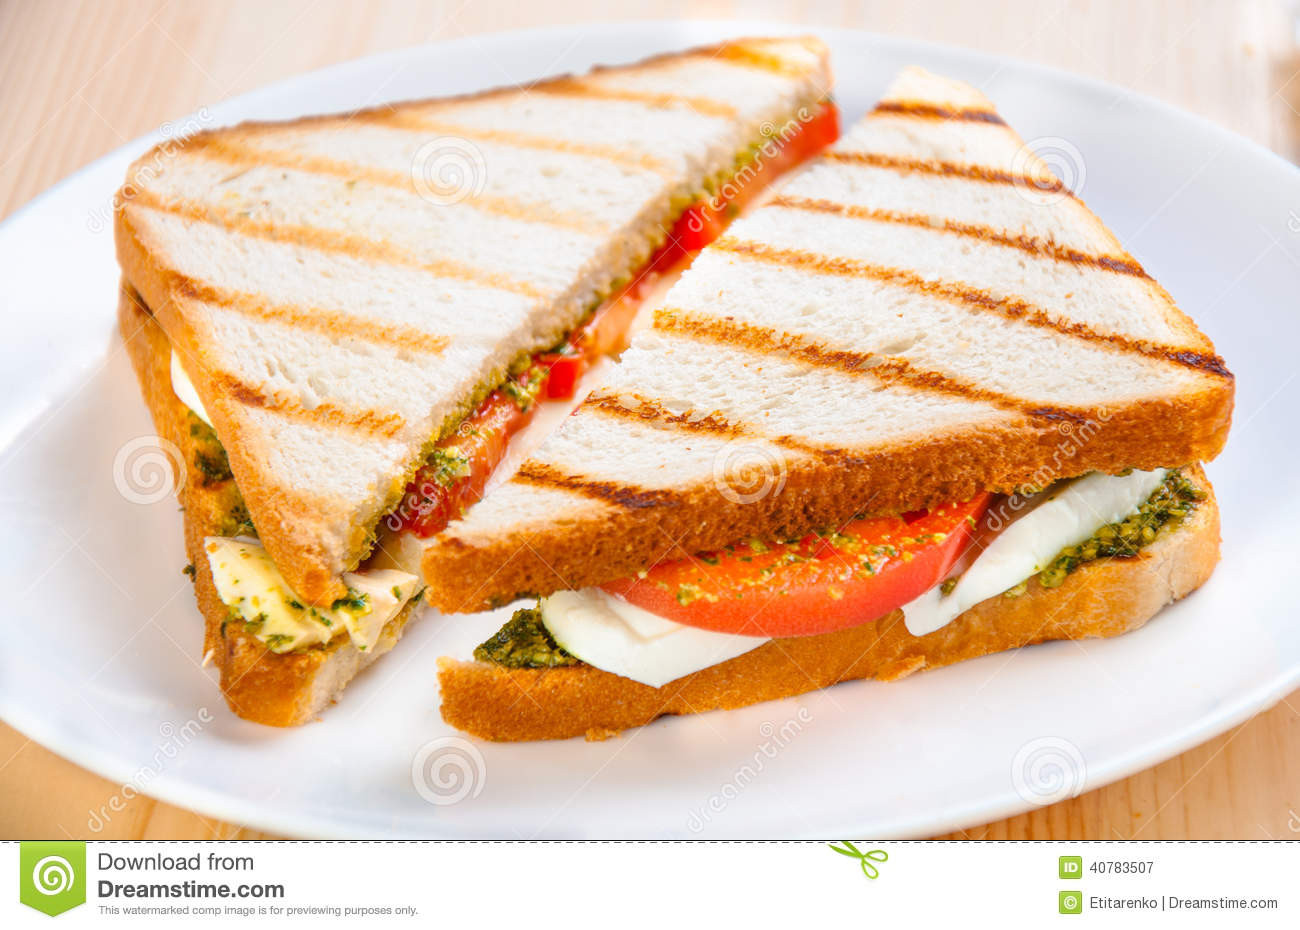 Healthy Sandwich Bread  Bread Sandwich With Cheese Tomato Healthy Ve arian